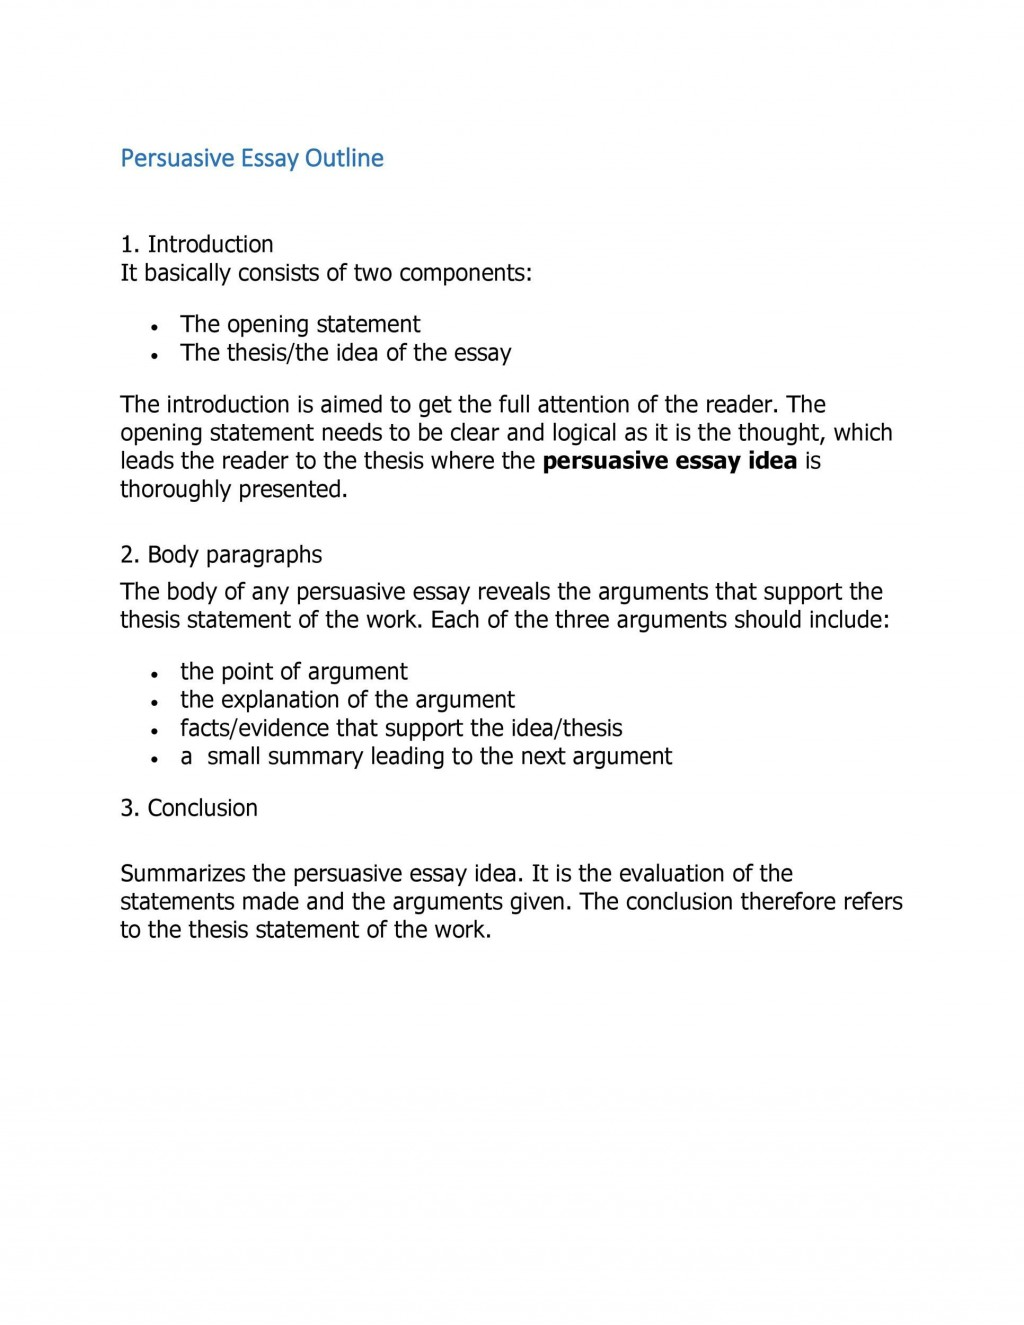 007 Simple College Persuasive Essay Outline Template Image Large